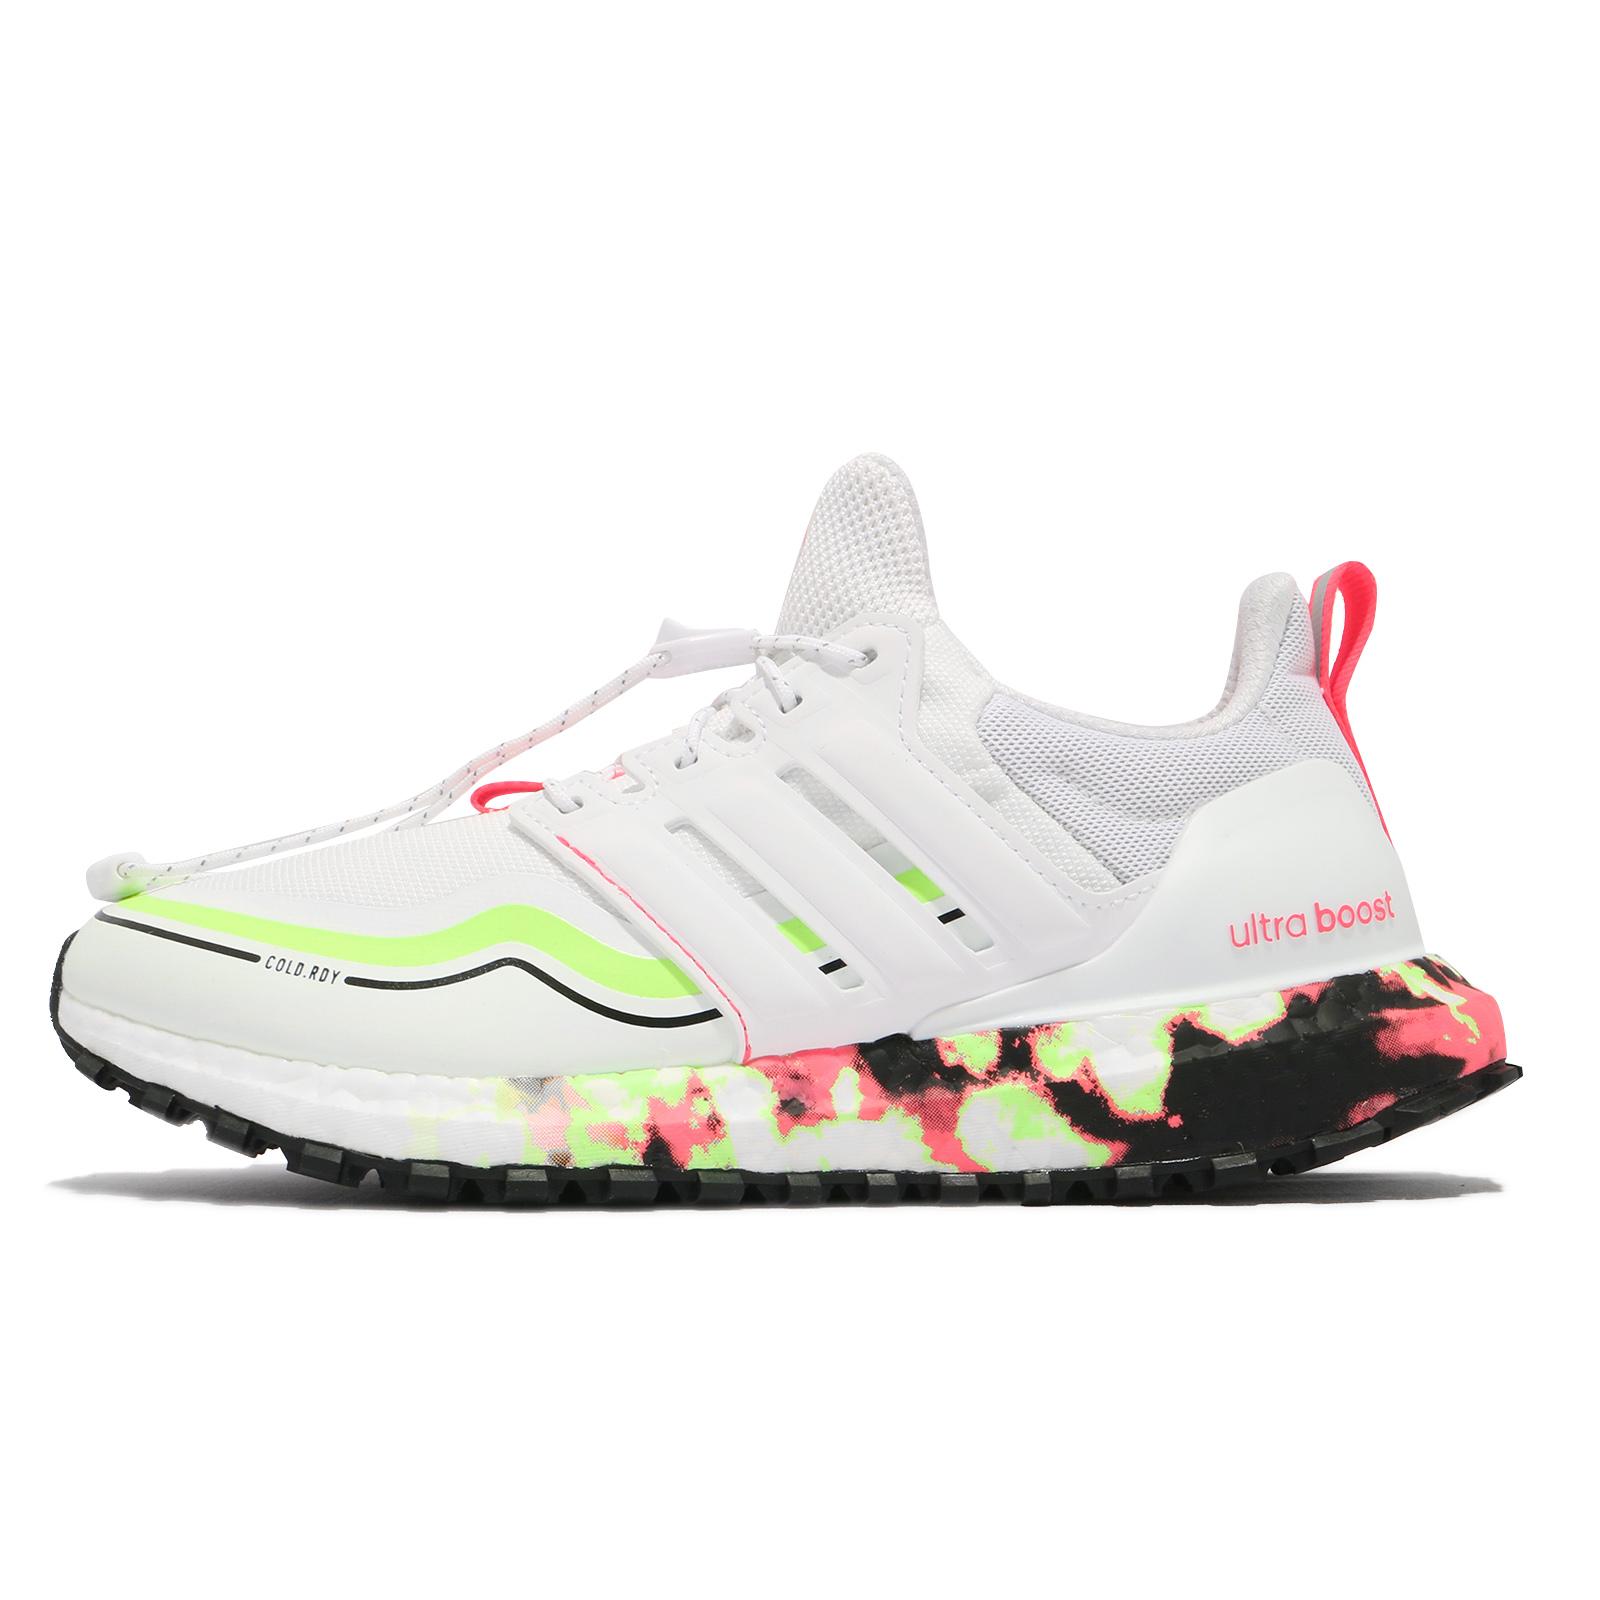 adidas 慢跑鞋 Ultraboost C.RDY DNA 白 粉紅 螢光綠 愛迪達 女鞋【ACS】 FV7017